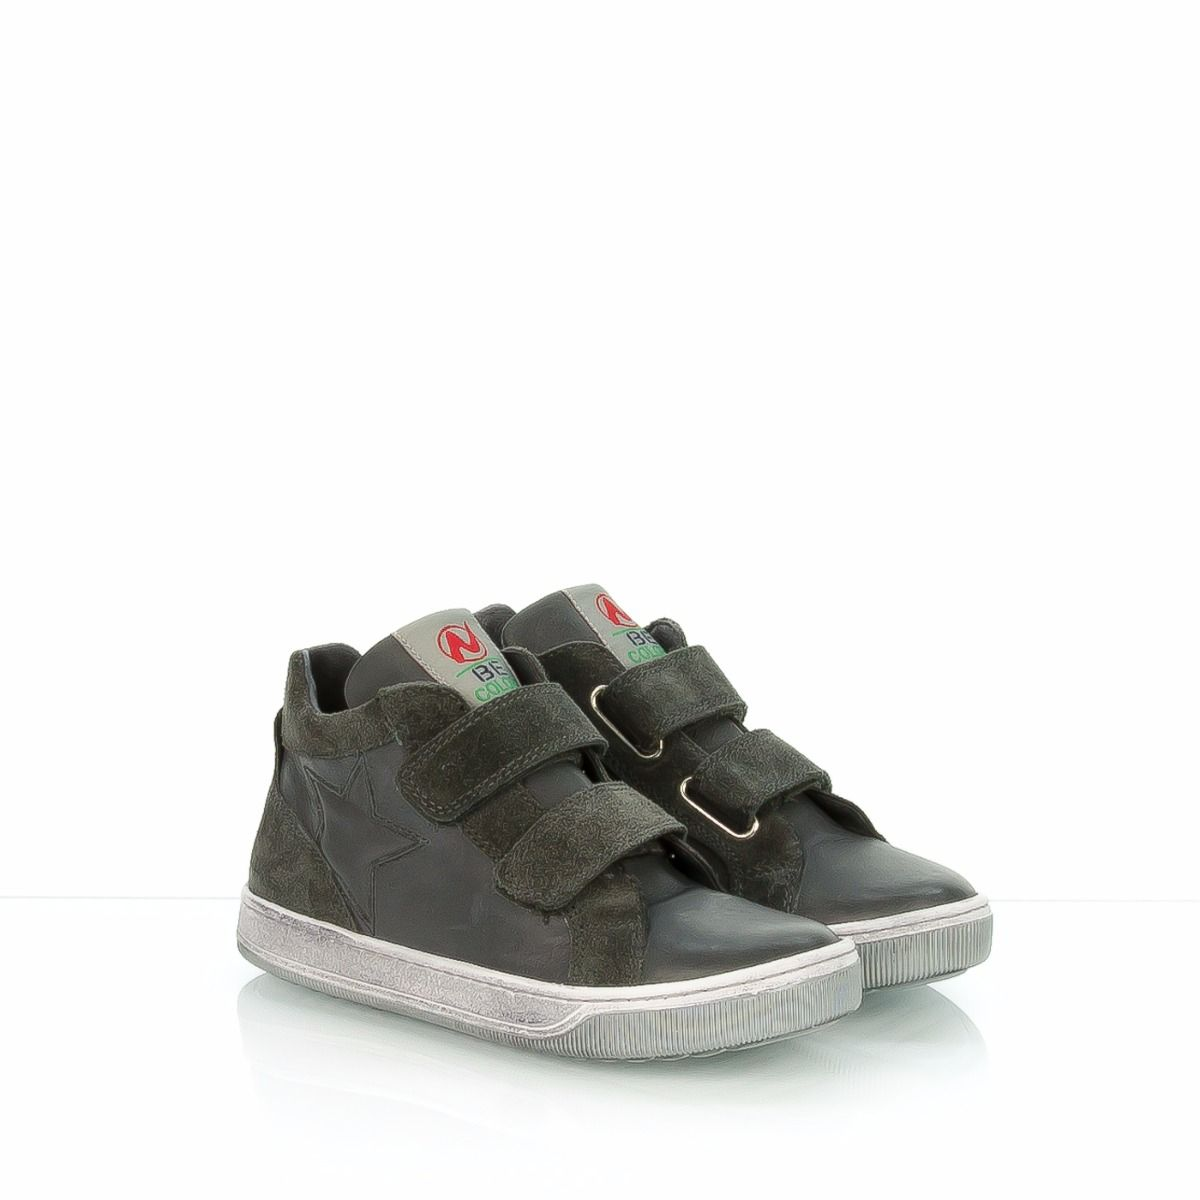 Sneakers in pelle da bambino OiwuvL17